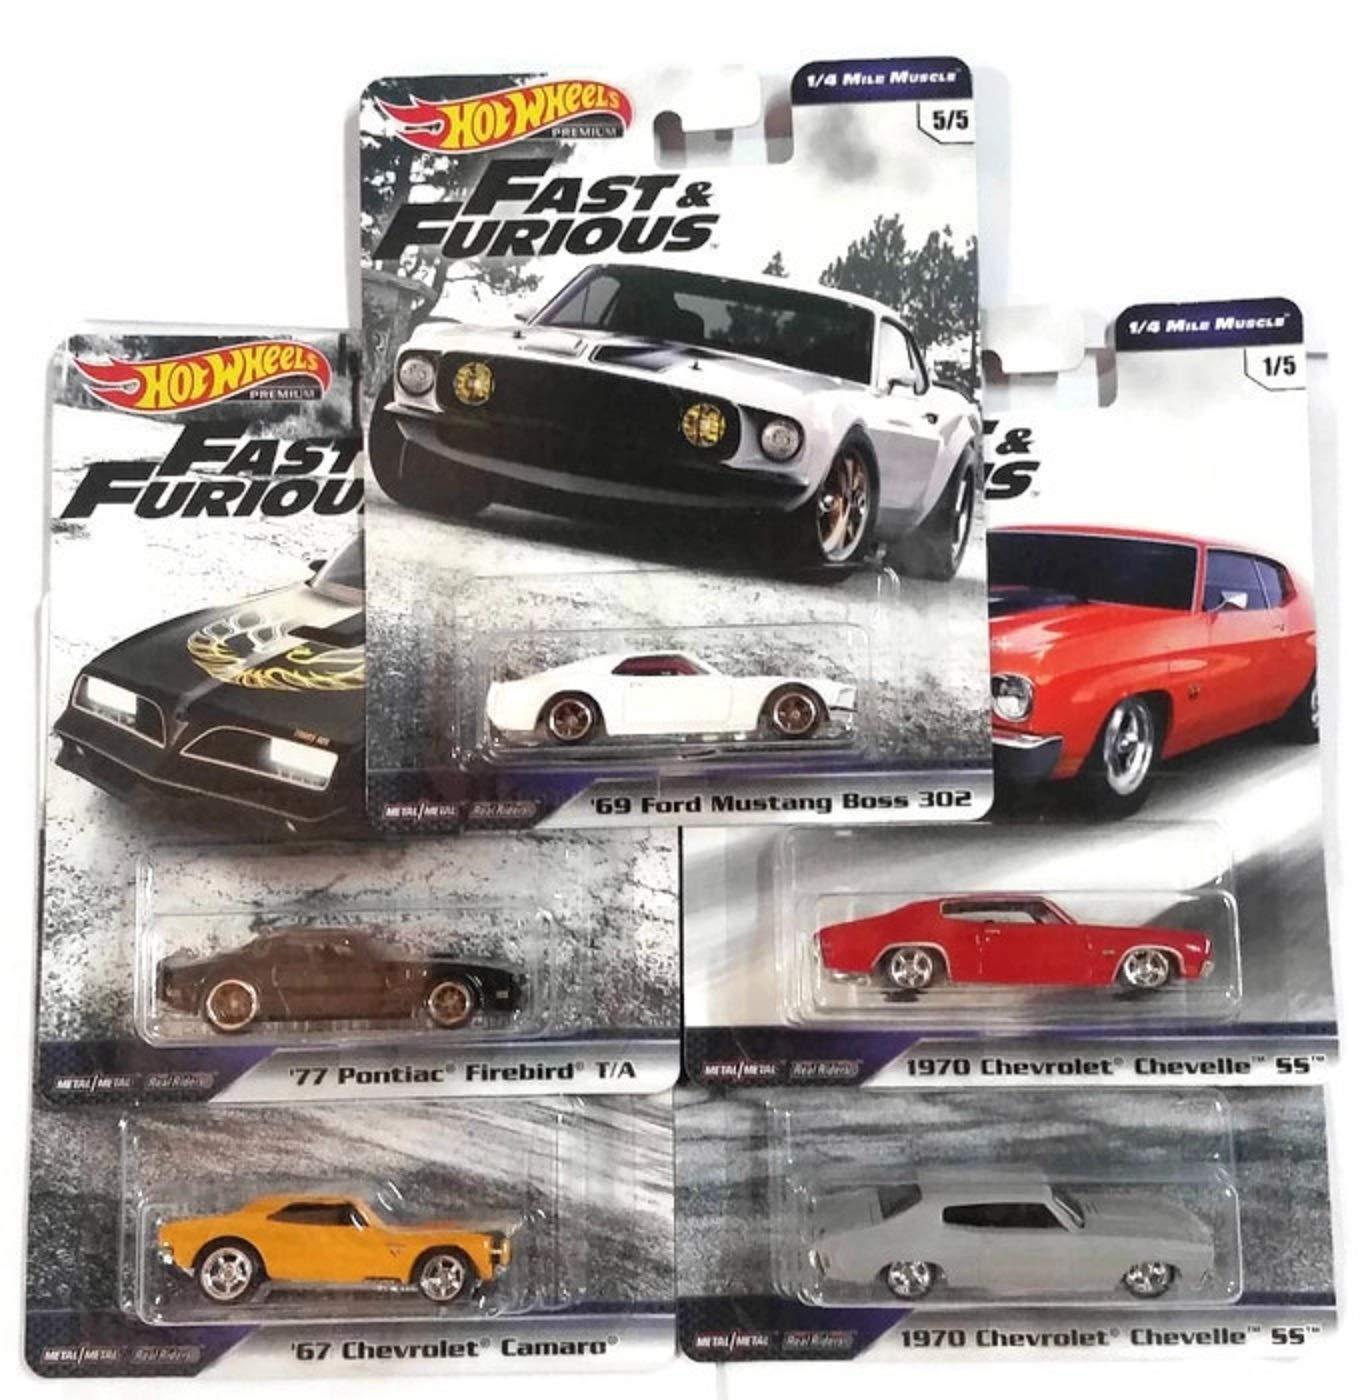 Hot Wheels 2019 Fast & Furious 1/4 Mile Muscle - Full 5 Car Set